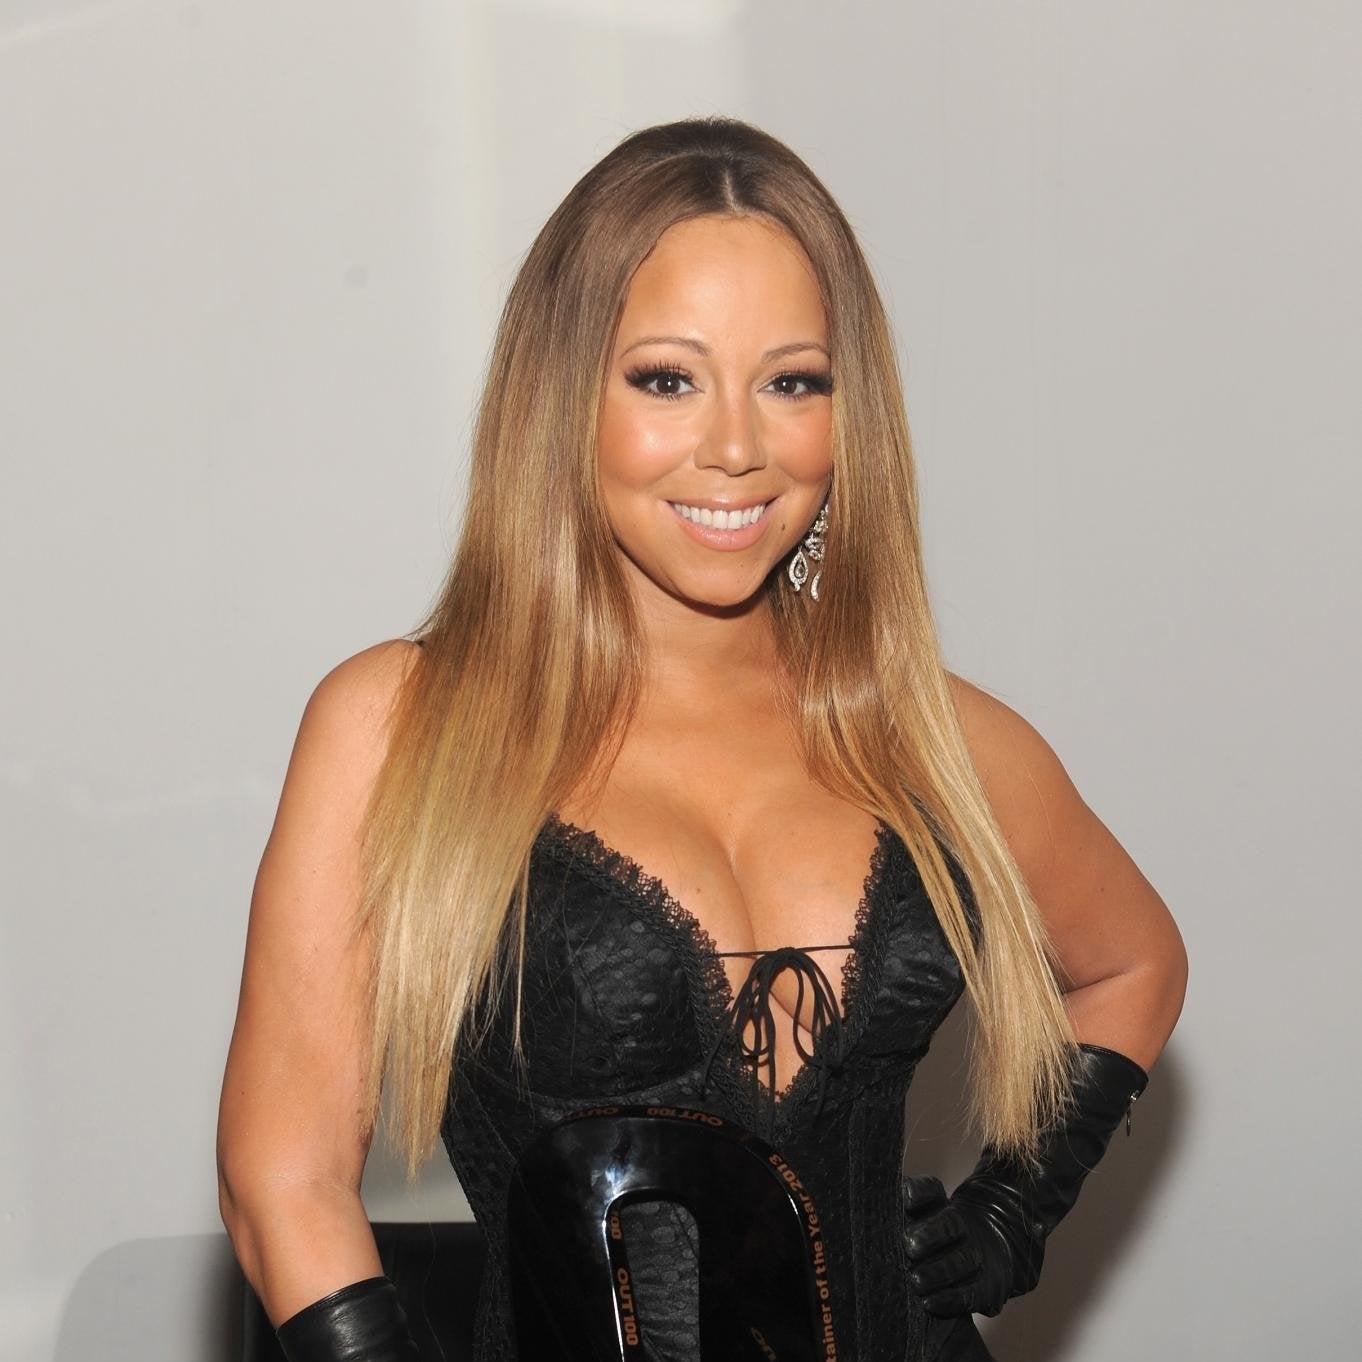 Coffee Talk: Mariah Carey Looks for Love on Match.com